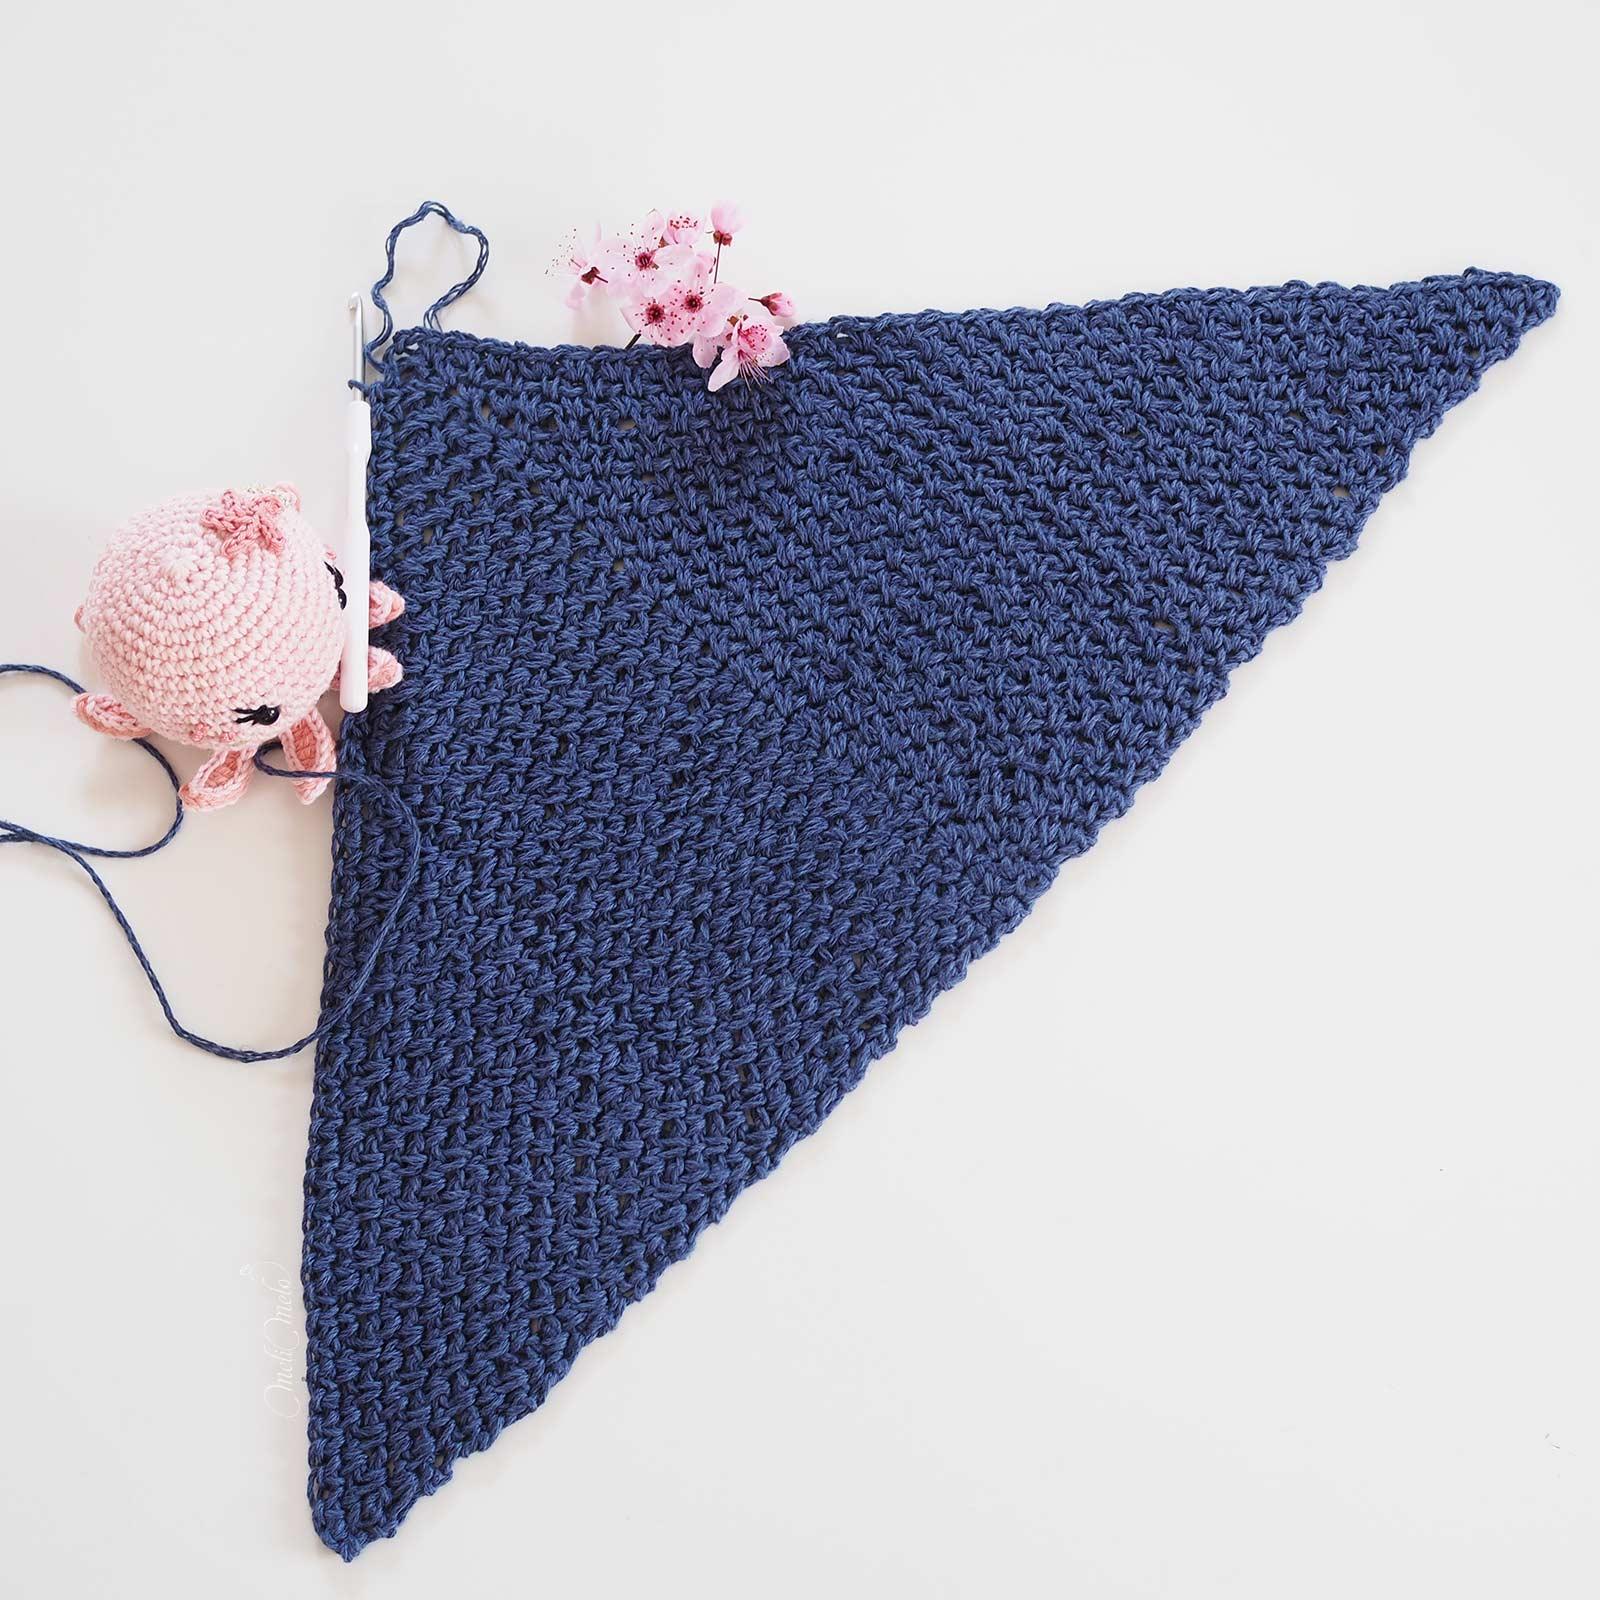 paniere-bramble-basket-1dogwoof-drops-bomull-lin-dark-blue-encours-laboutiquedemelimelo